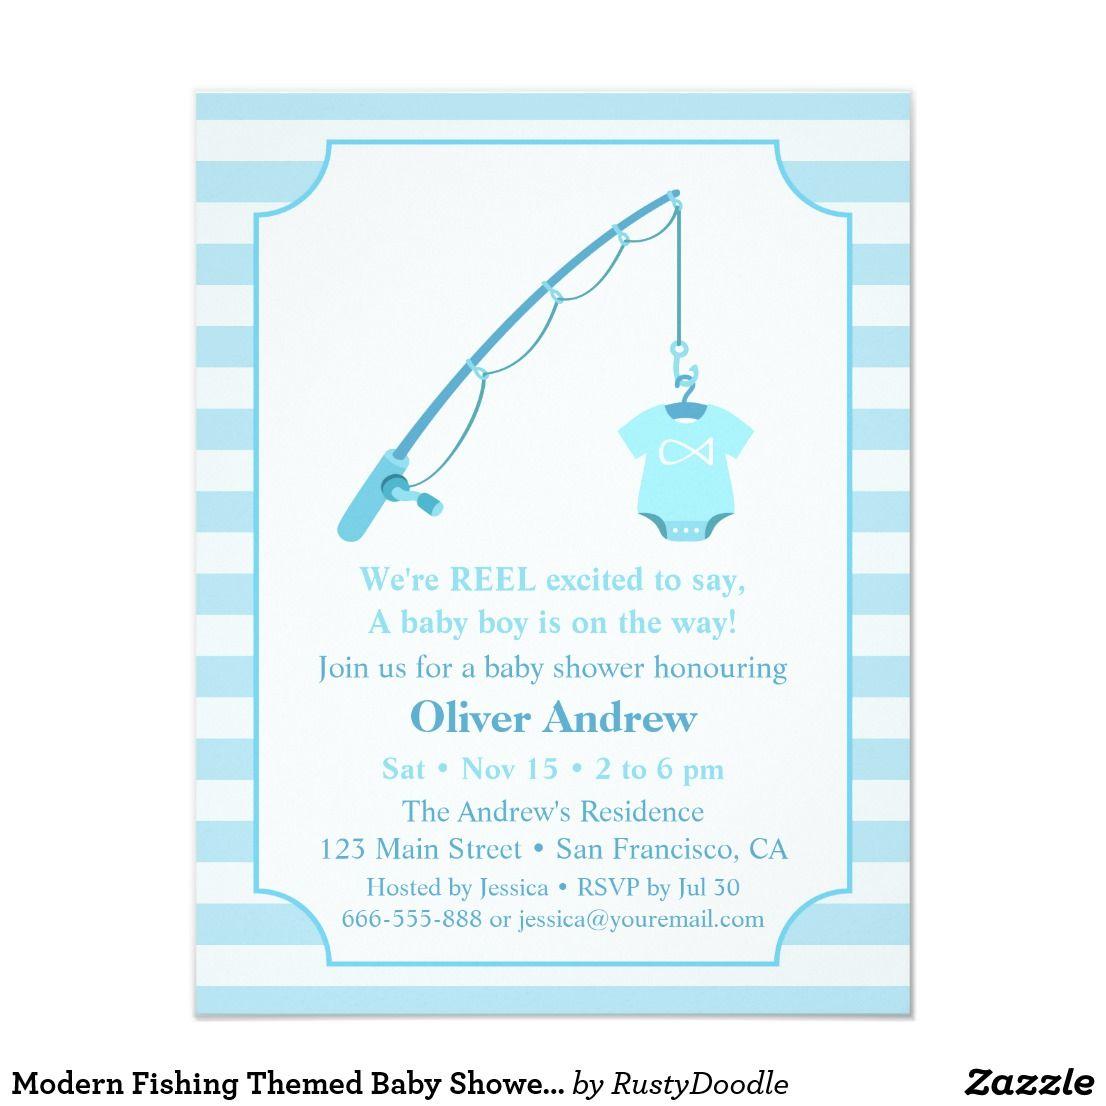 Modern Fishing Themed Baby Shower Invitations | Shower invitations